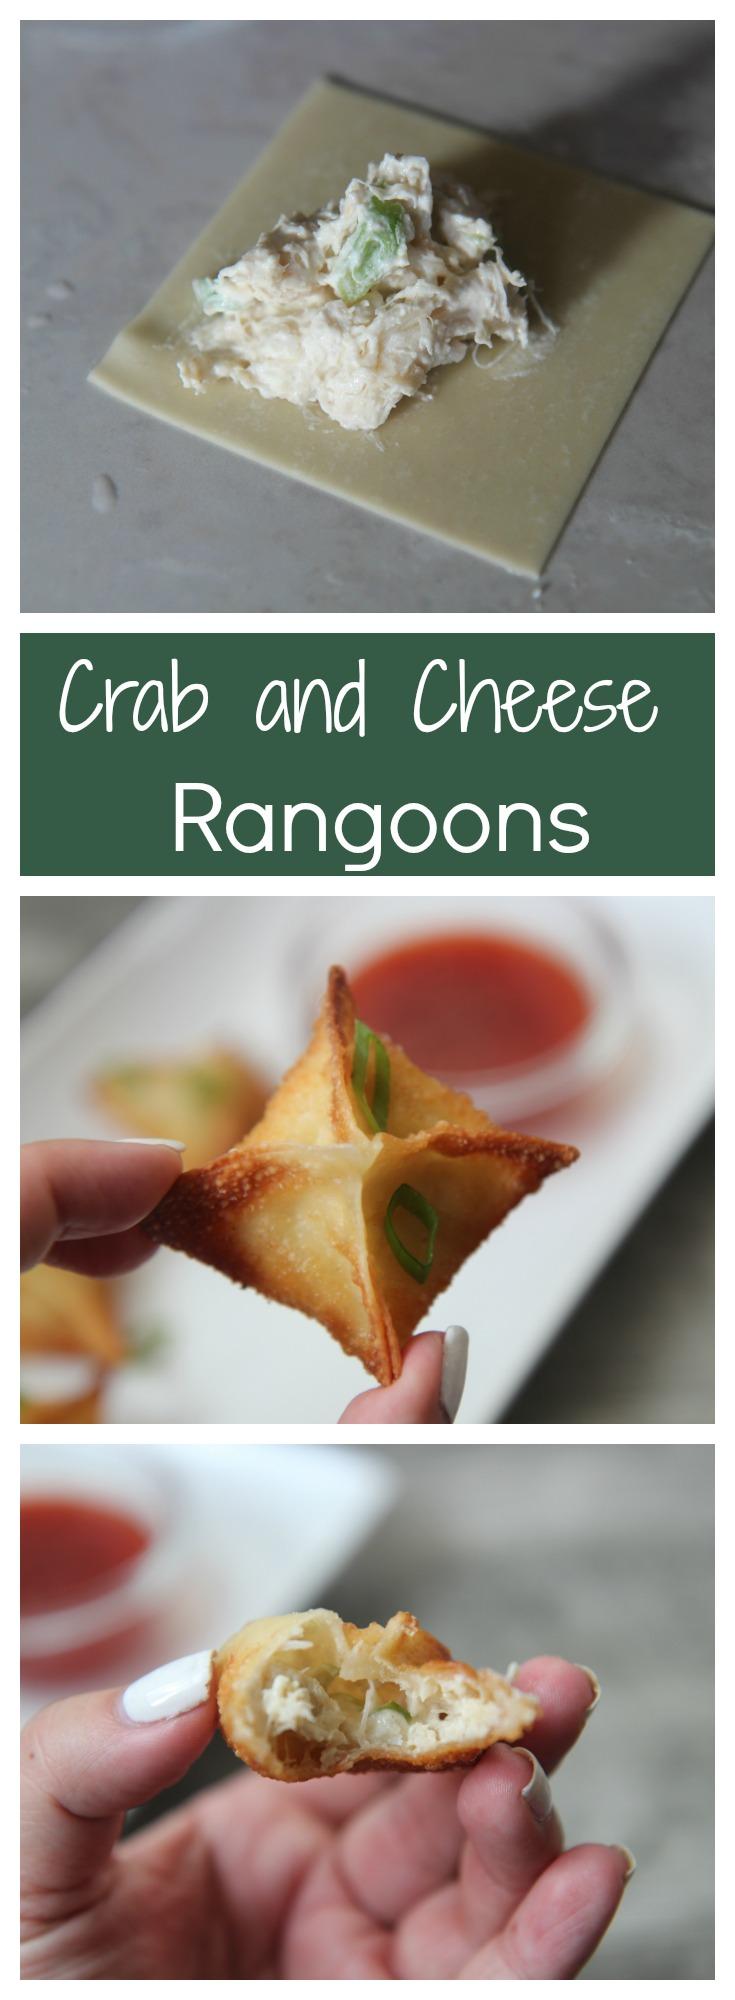 Cream Cheese and Crab Rangoon recipe.